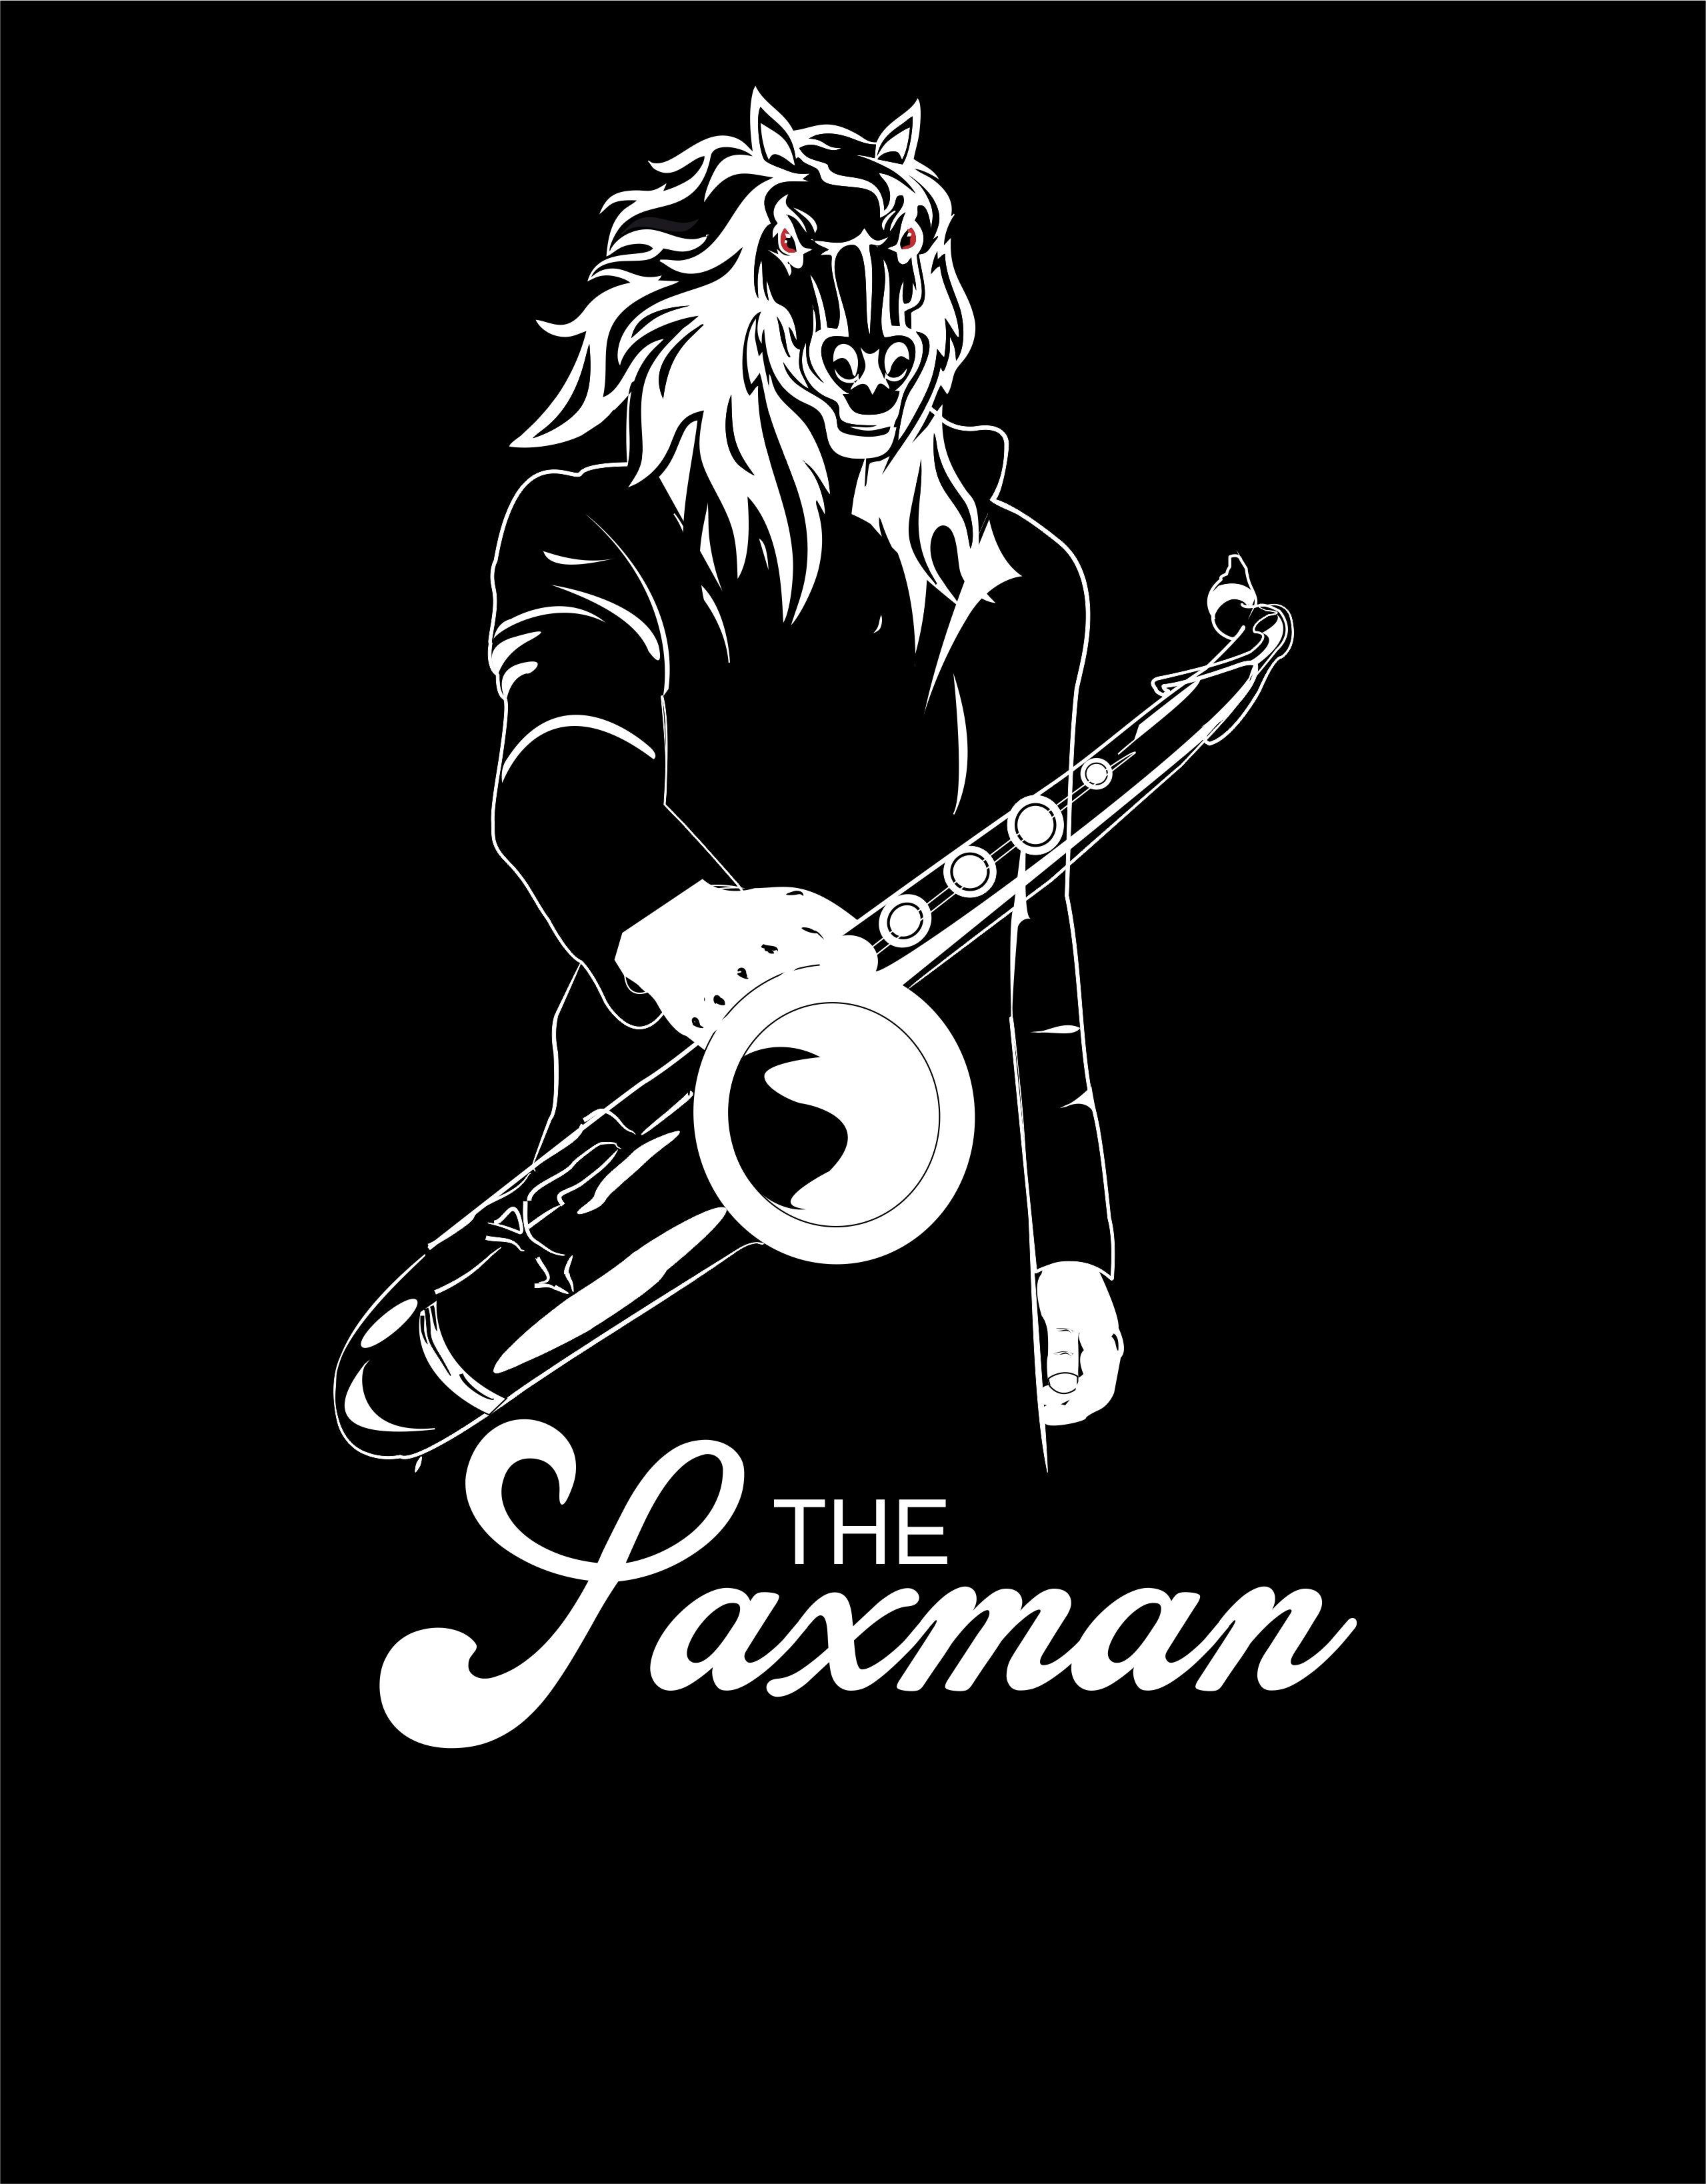 Create The Saxman Vector with Corel Draw X7 (Dengan gambar